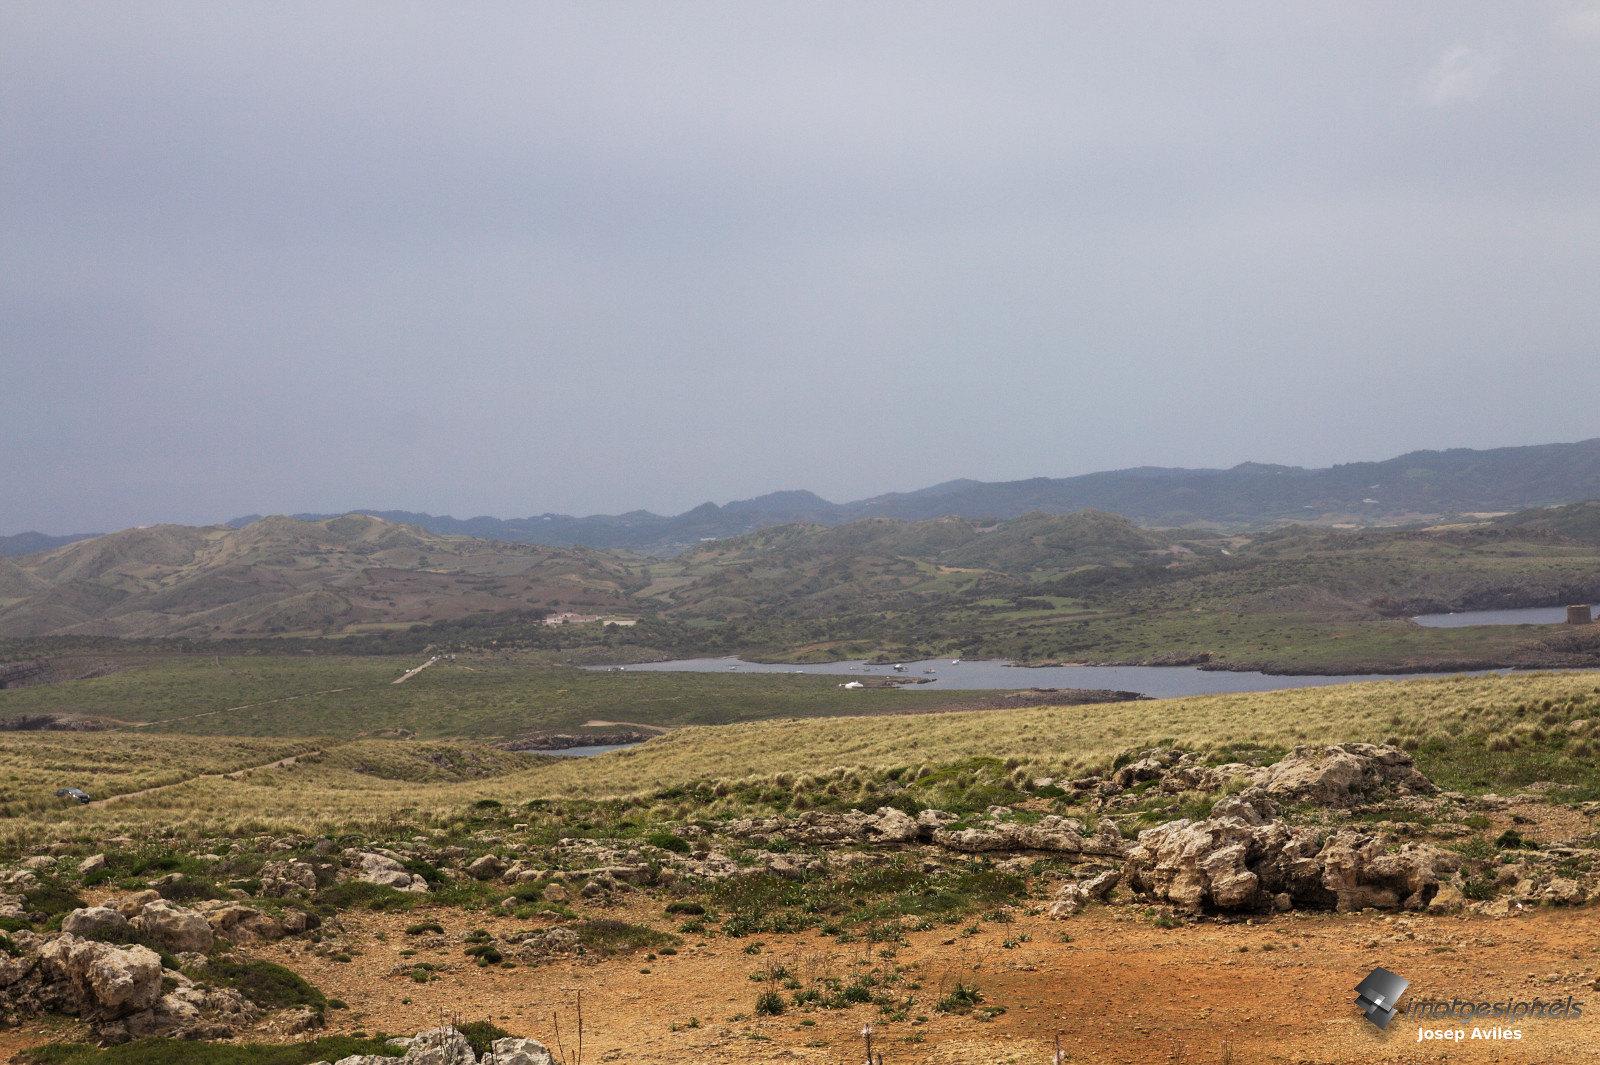 Vista des del Far de Cavalleria